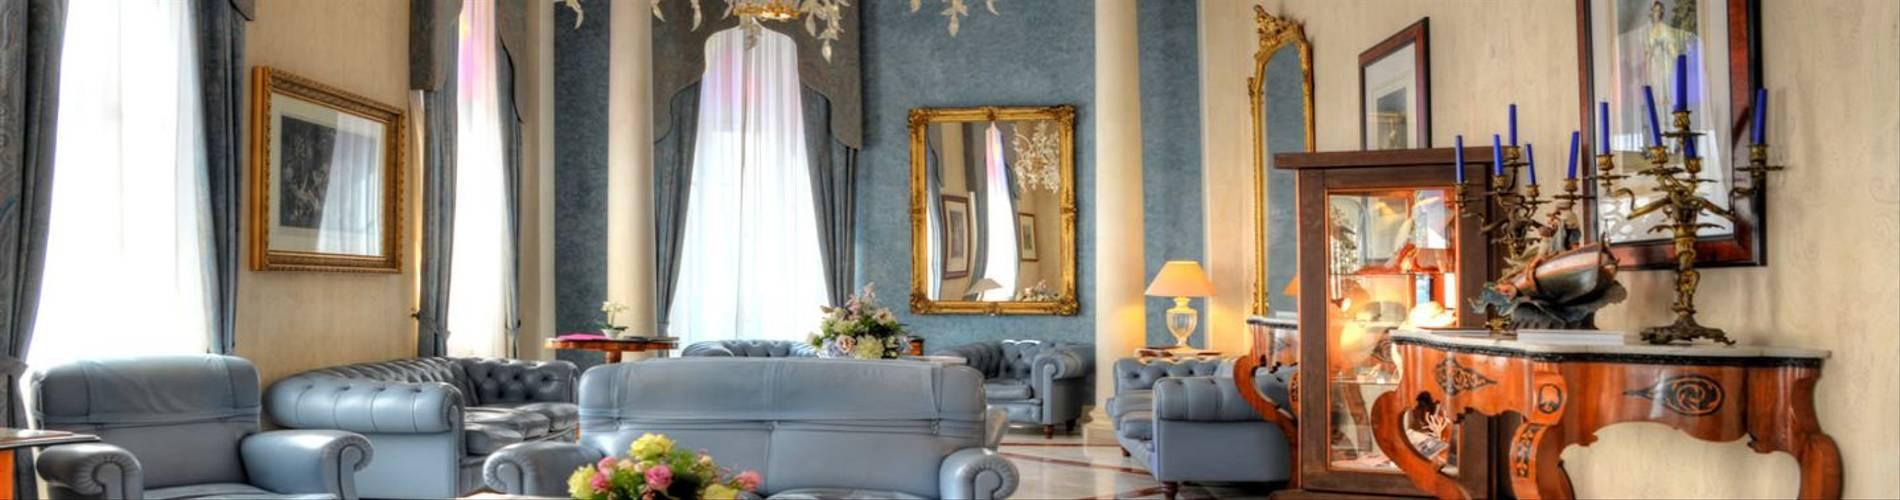 Grand Hotel Ortigia, Sicily, Italy (18).jpg